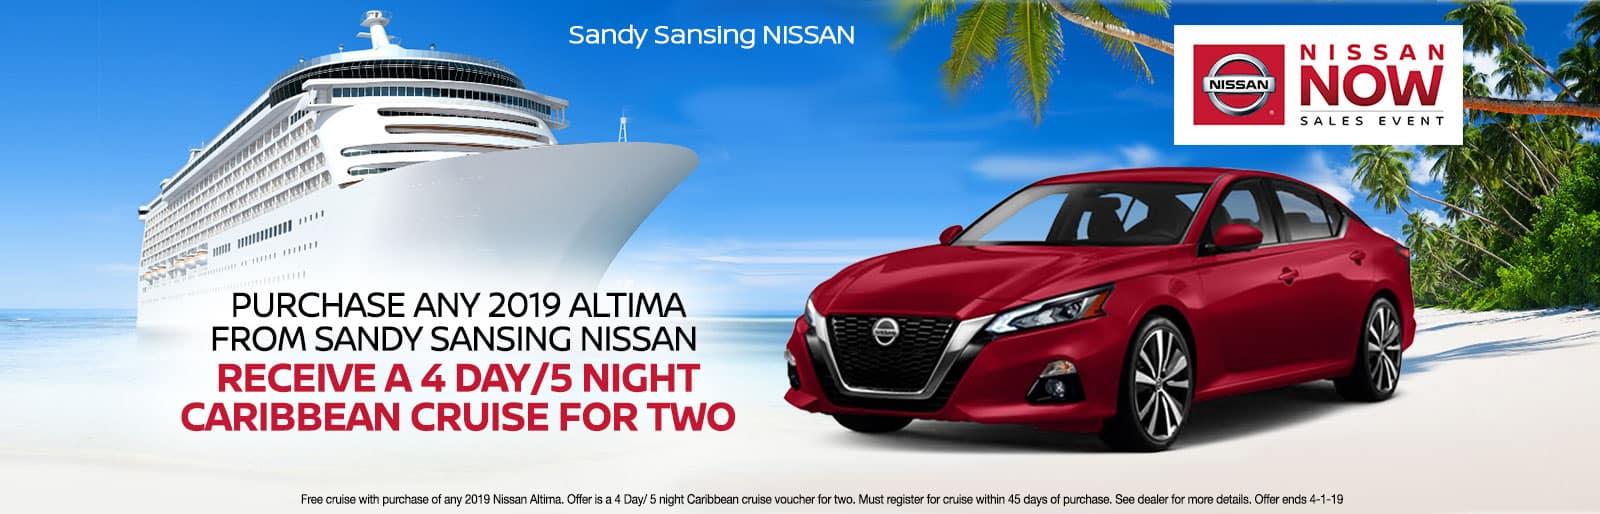 Sandy Sansing Nissan Pensacola FL Altima Cruise Special